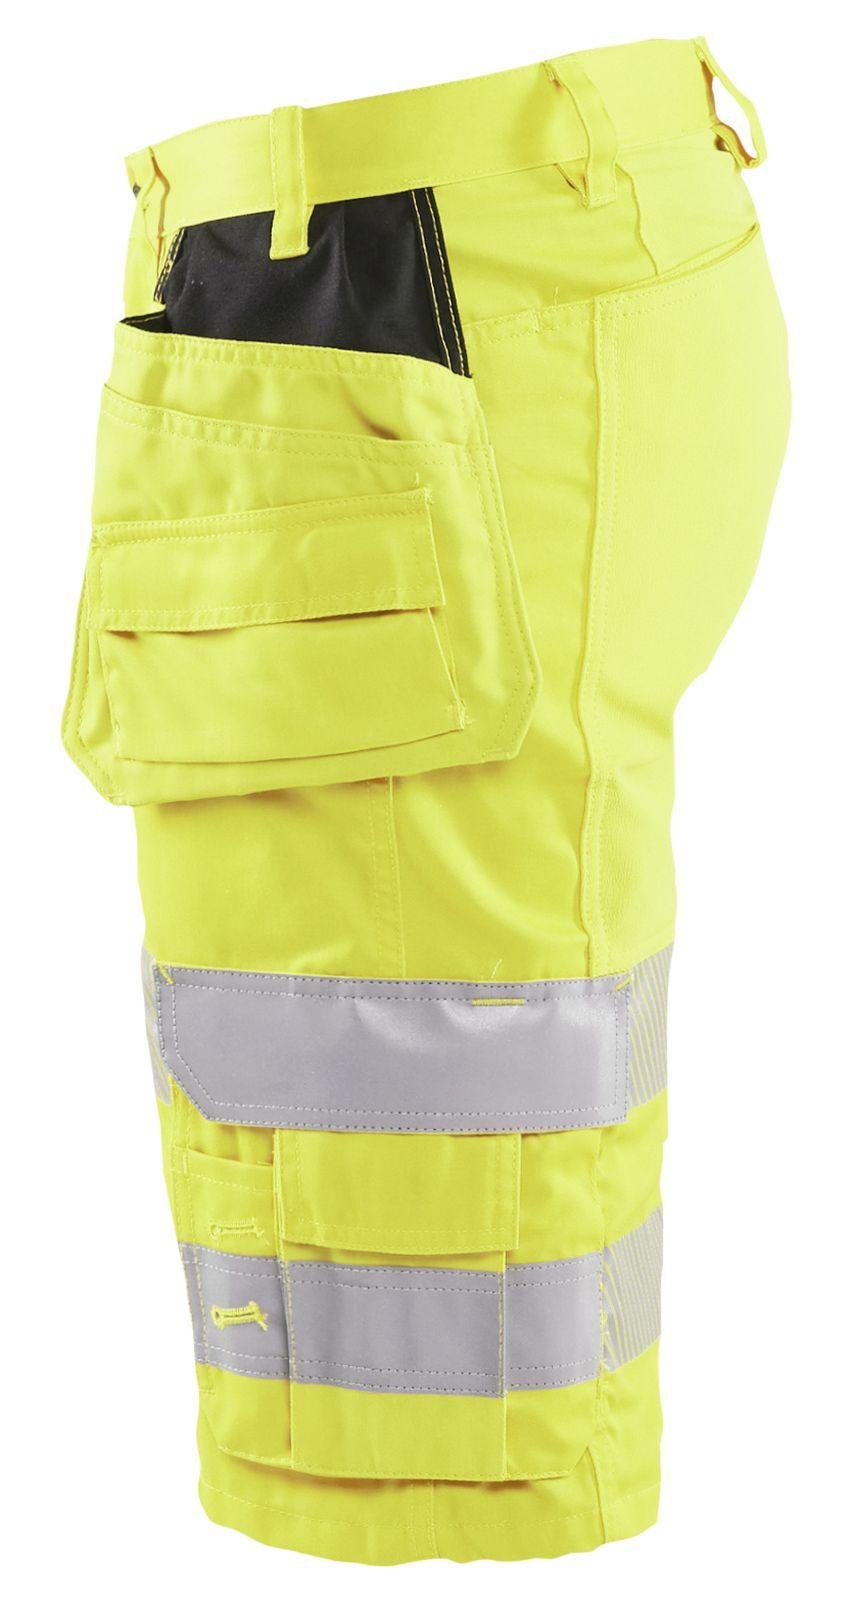 Blaklader Korte werkbroeken 15861811 High Vis fluo-geel(3300)